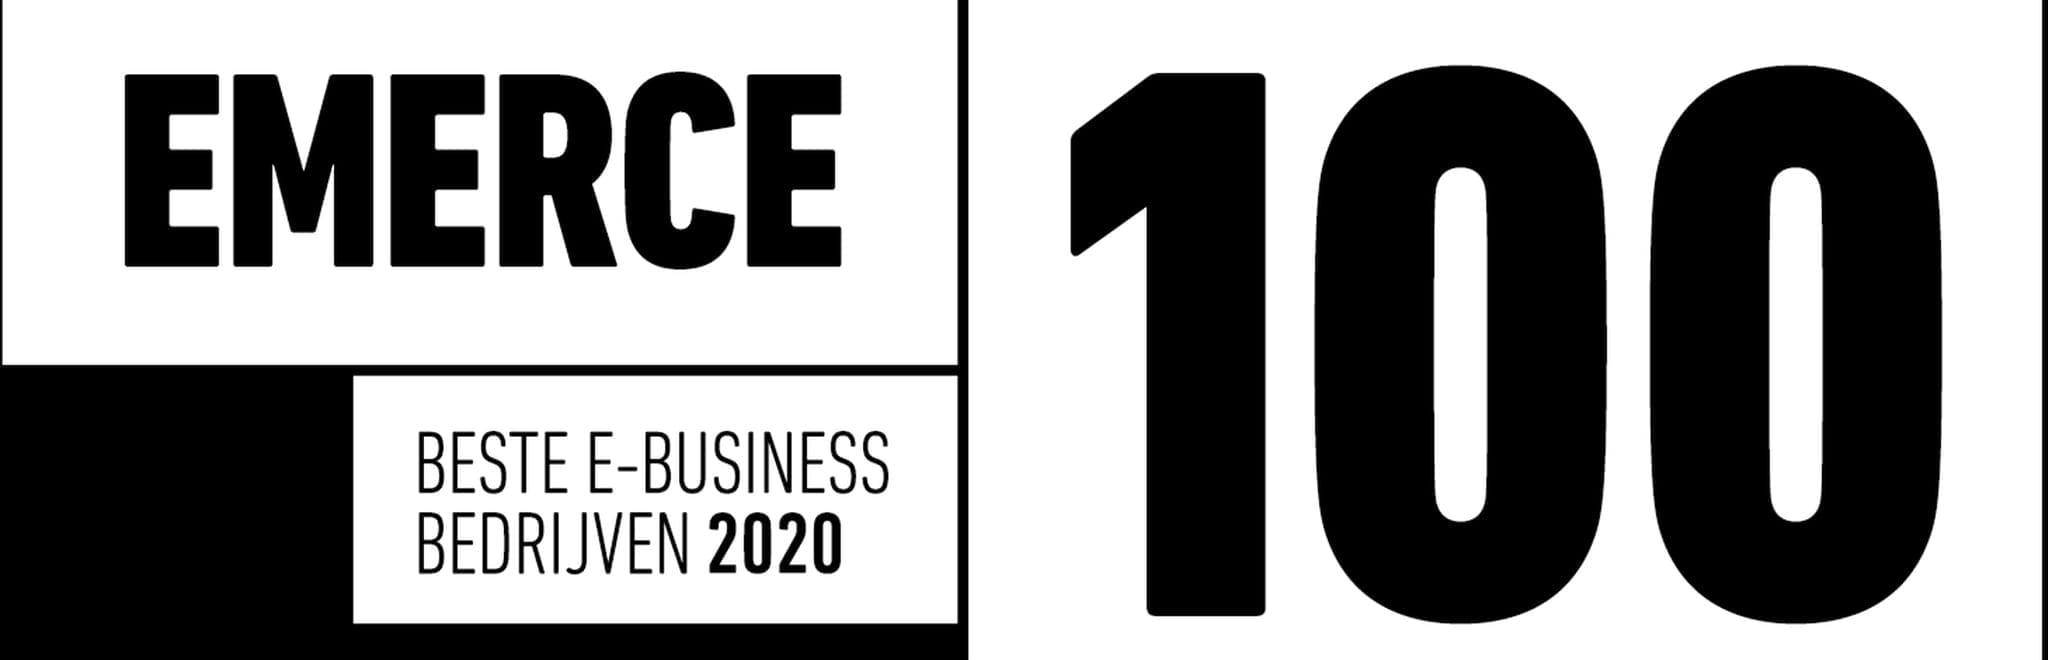 Emerce100 2020